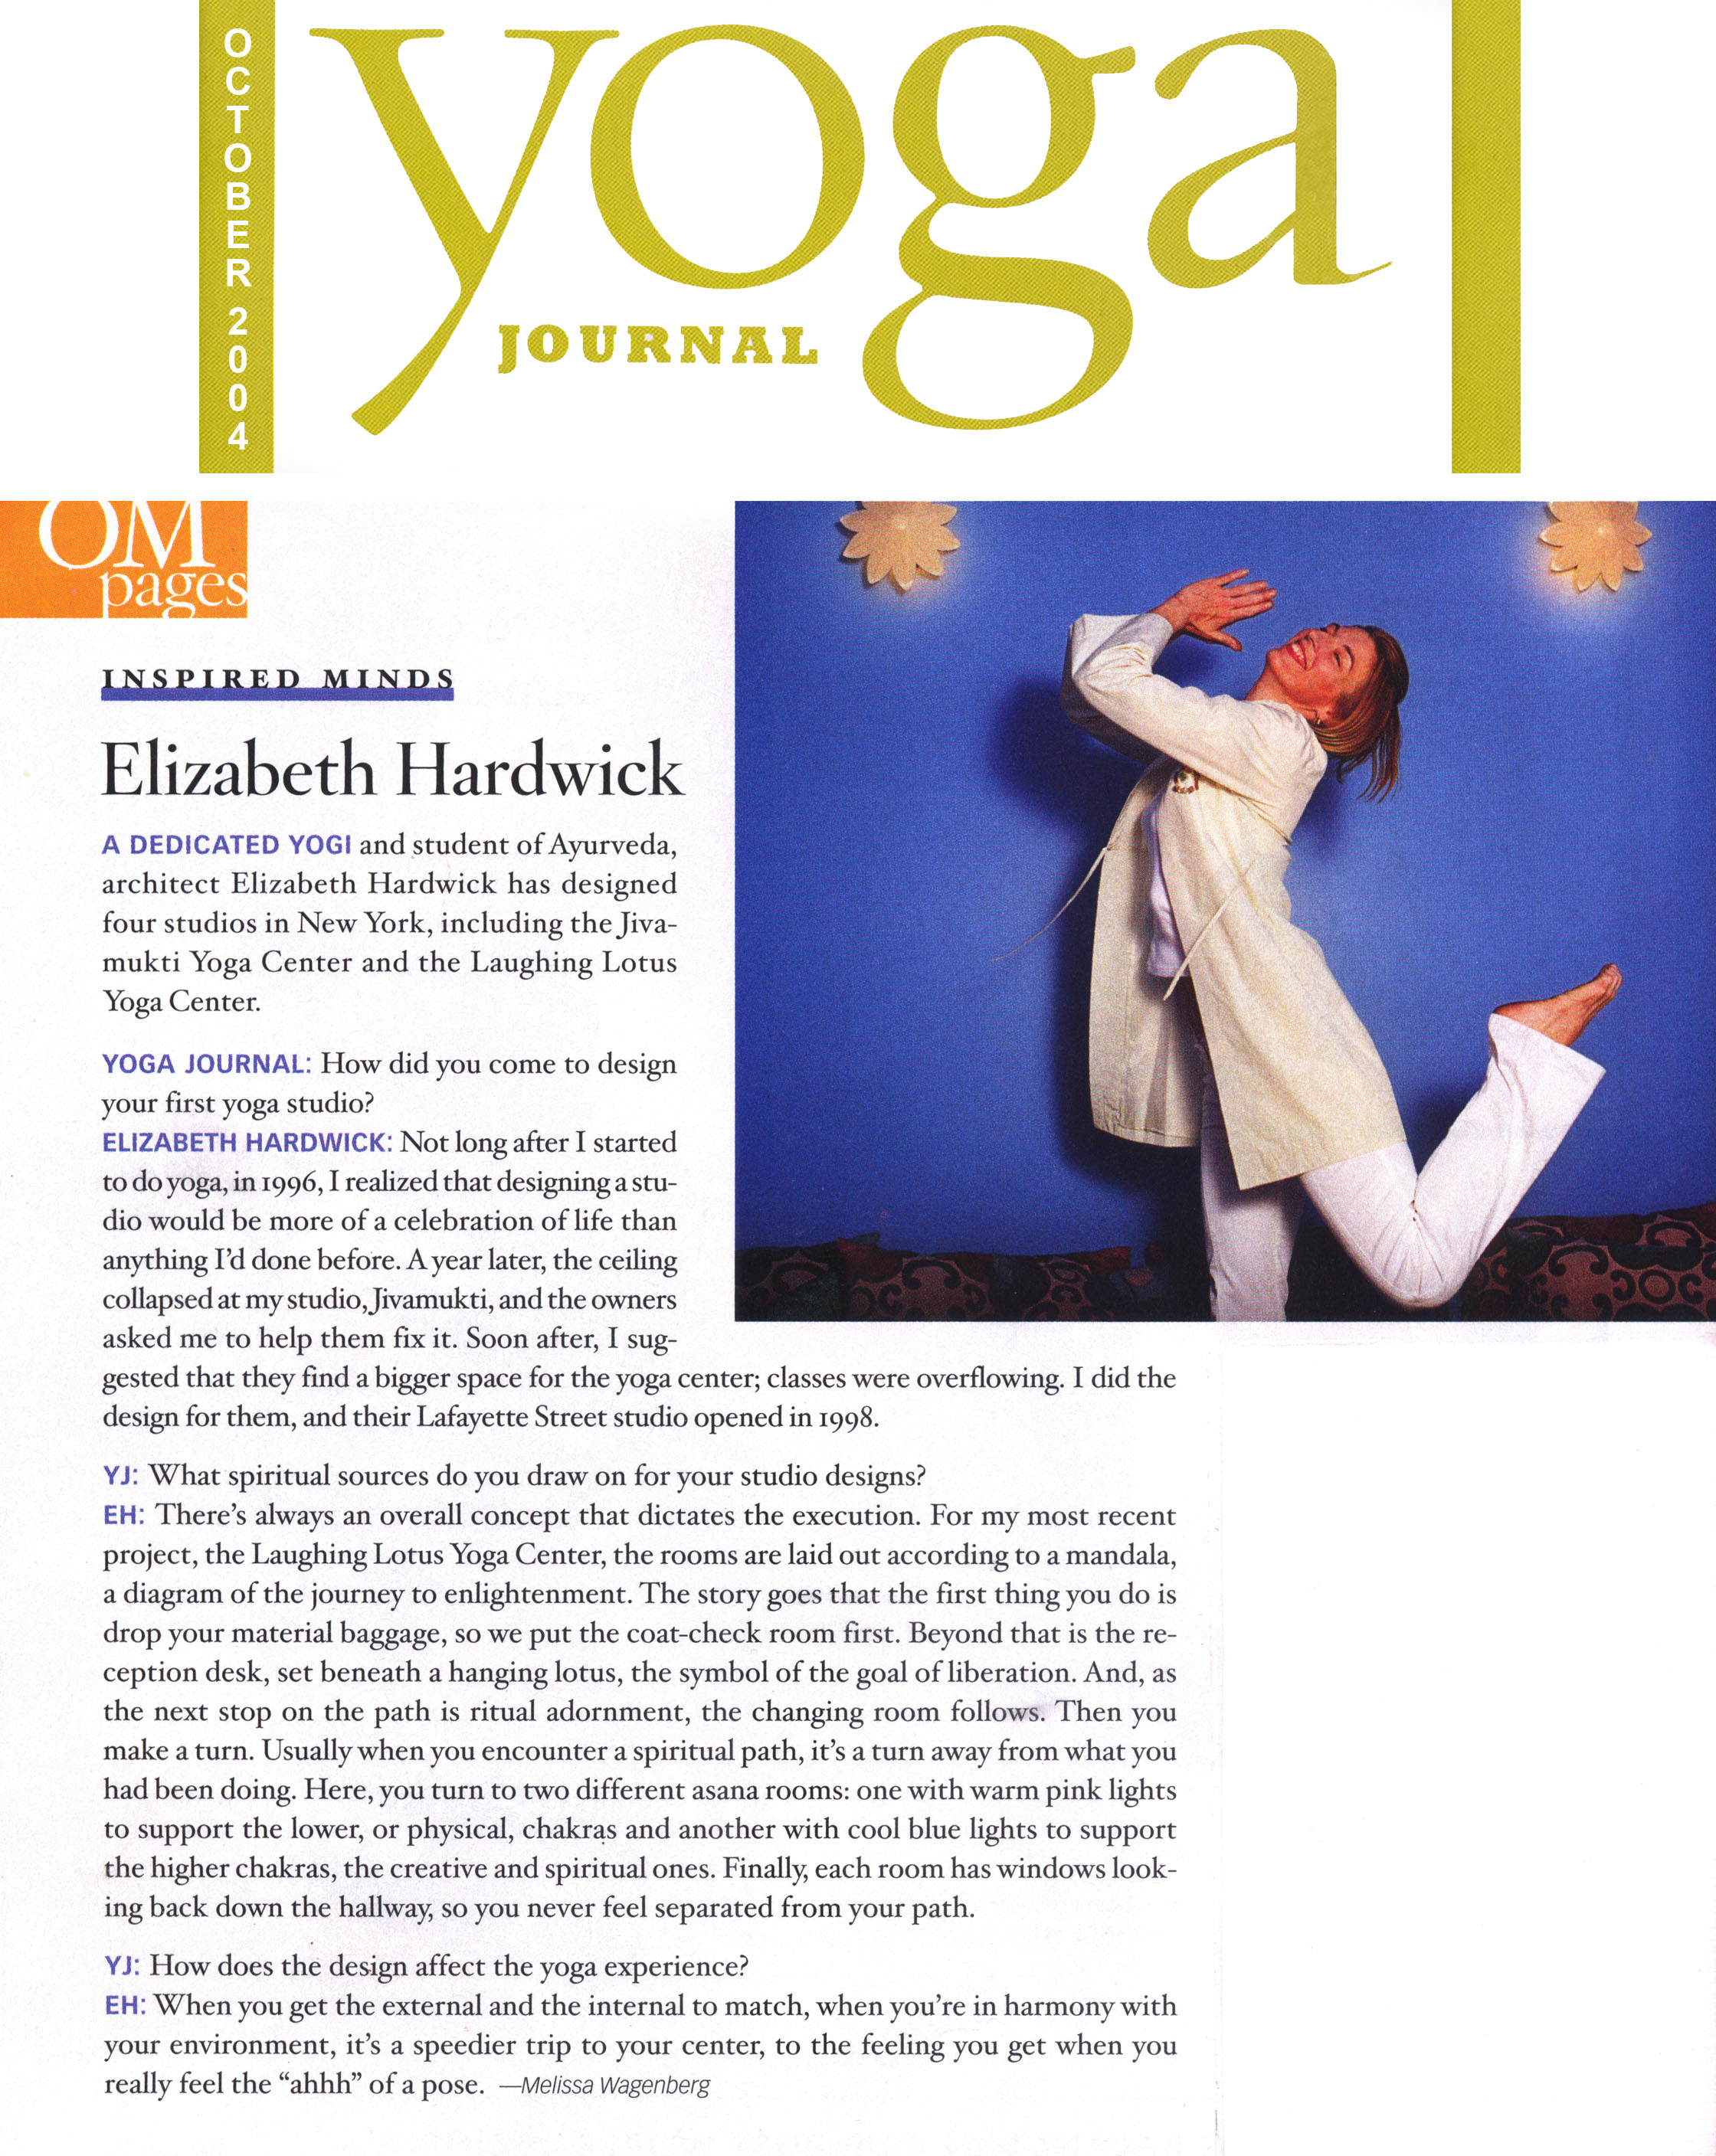 Yoga Journal Articlewhiteheader_300dpi.jpg